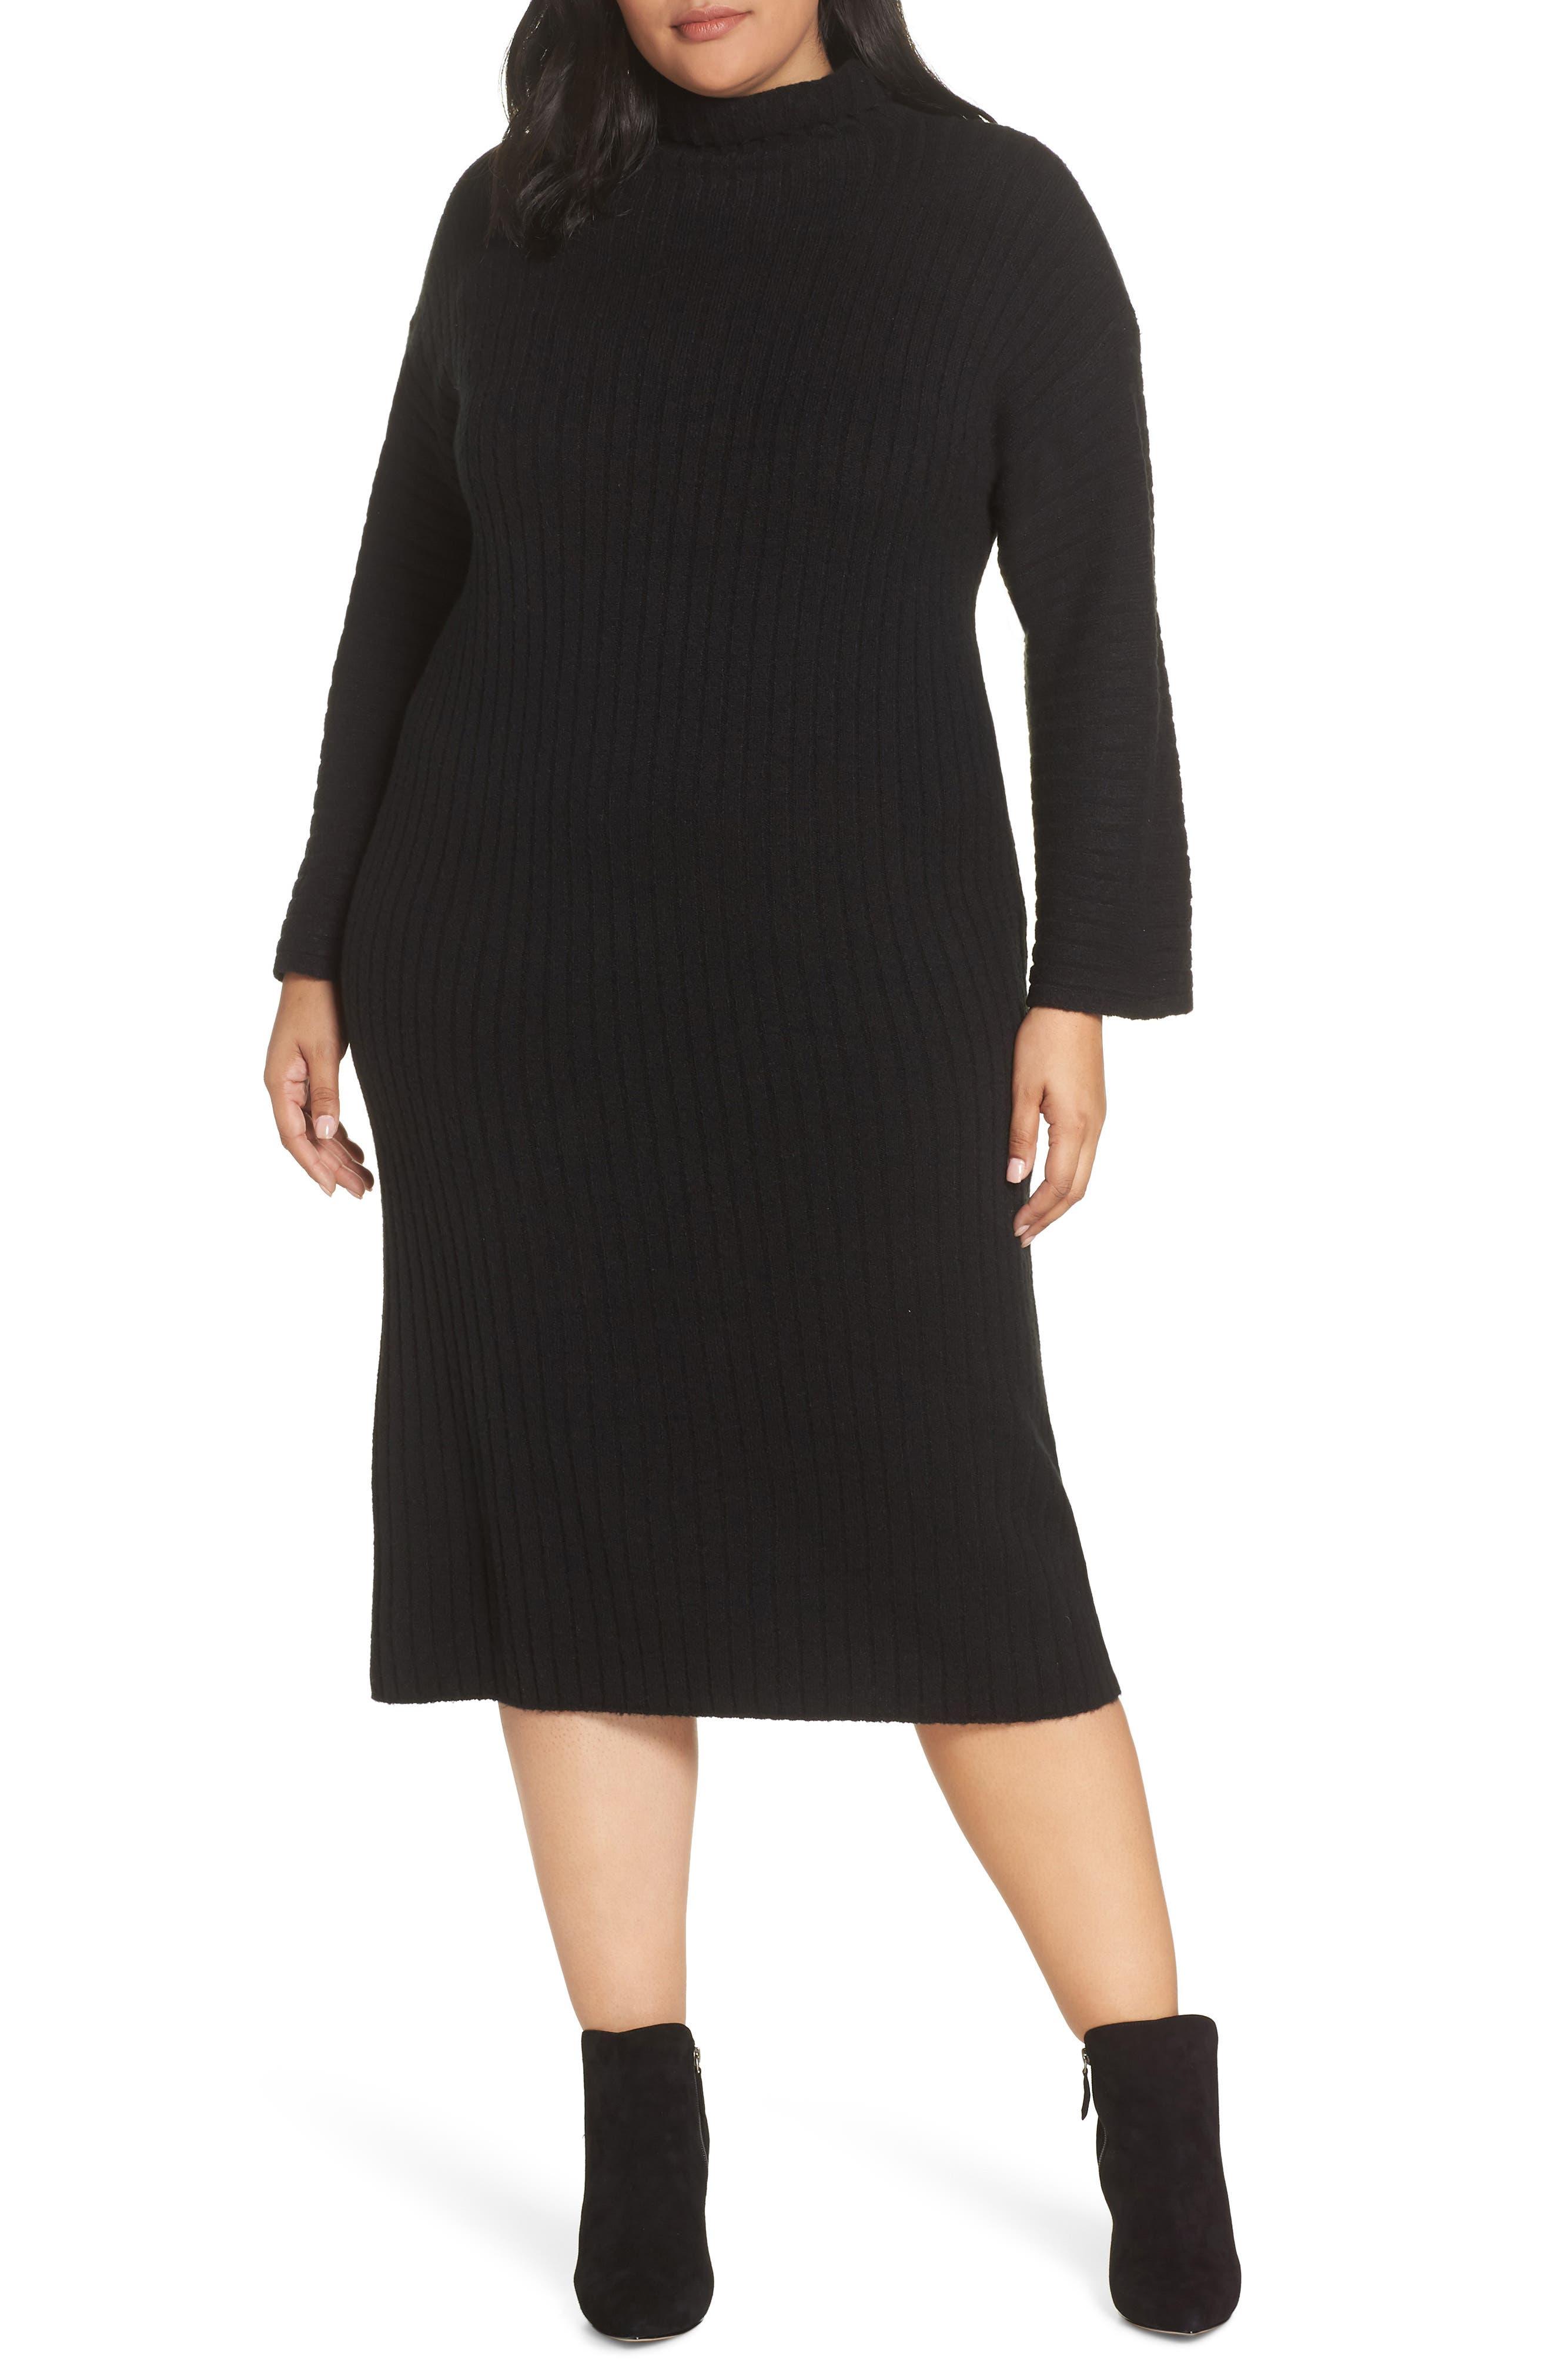 LEITH Ribbed Midi Sweater Dress, Main, color, BLACK